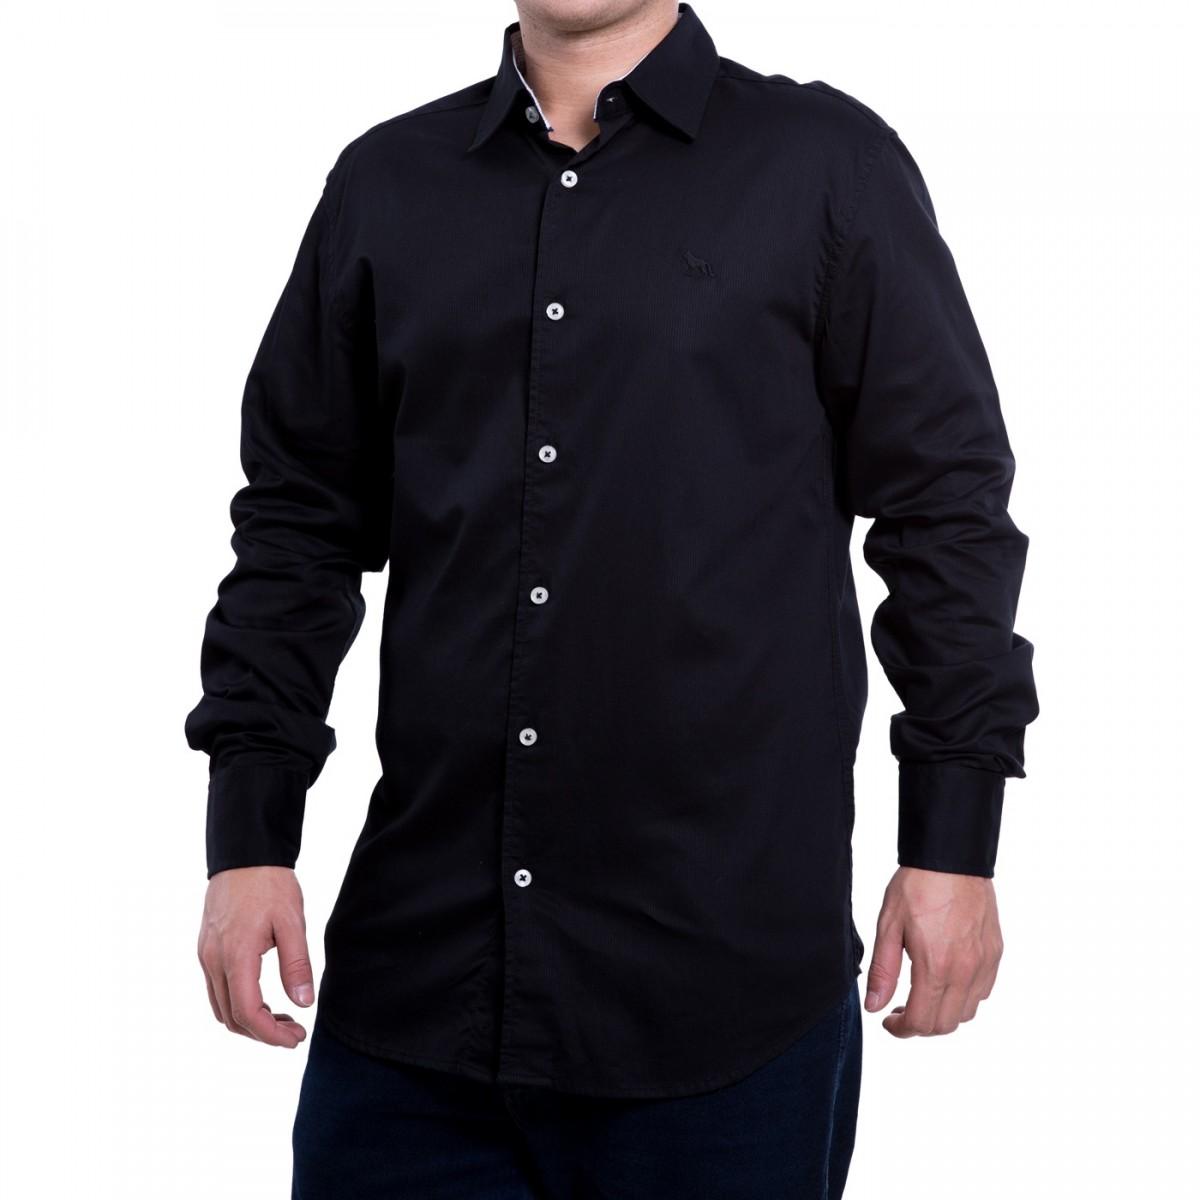 416fc82676f8a Bizz Store - Camisa Social Masculina Acostamento Manga Longa Preta